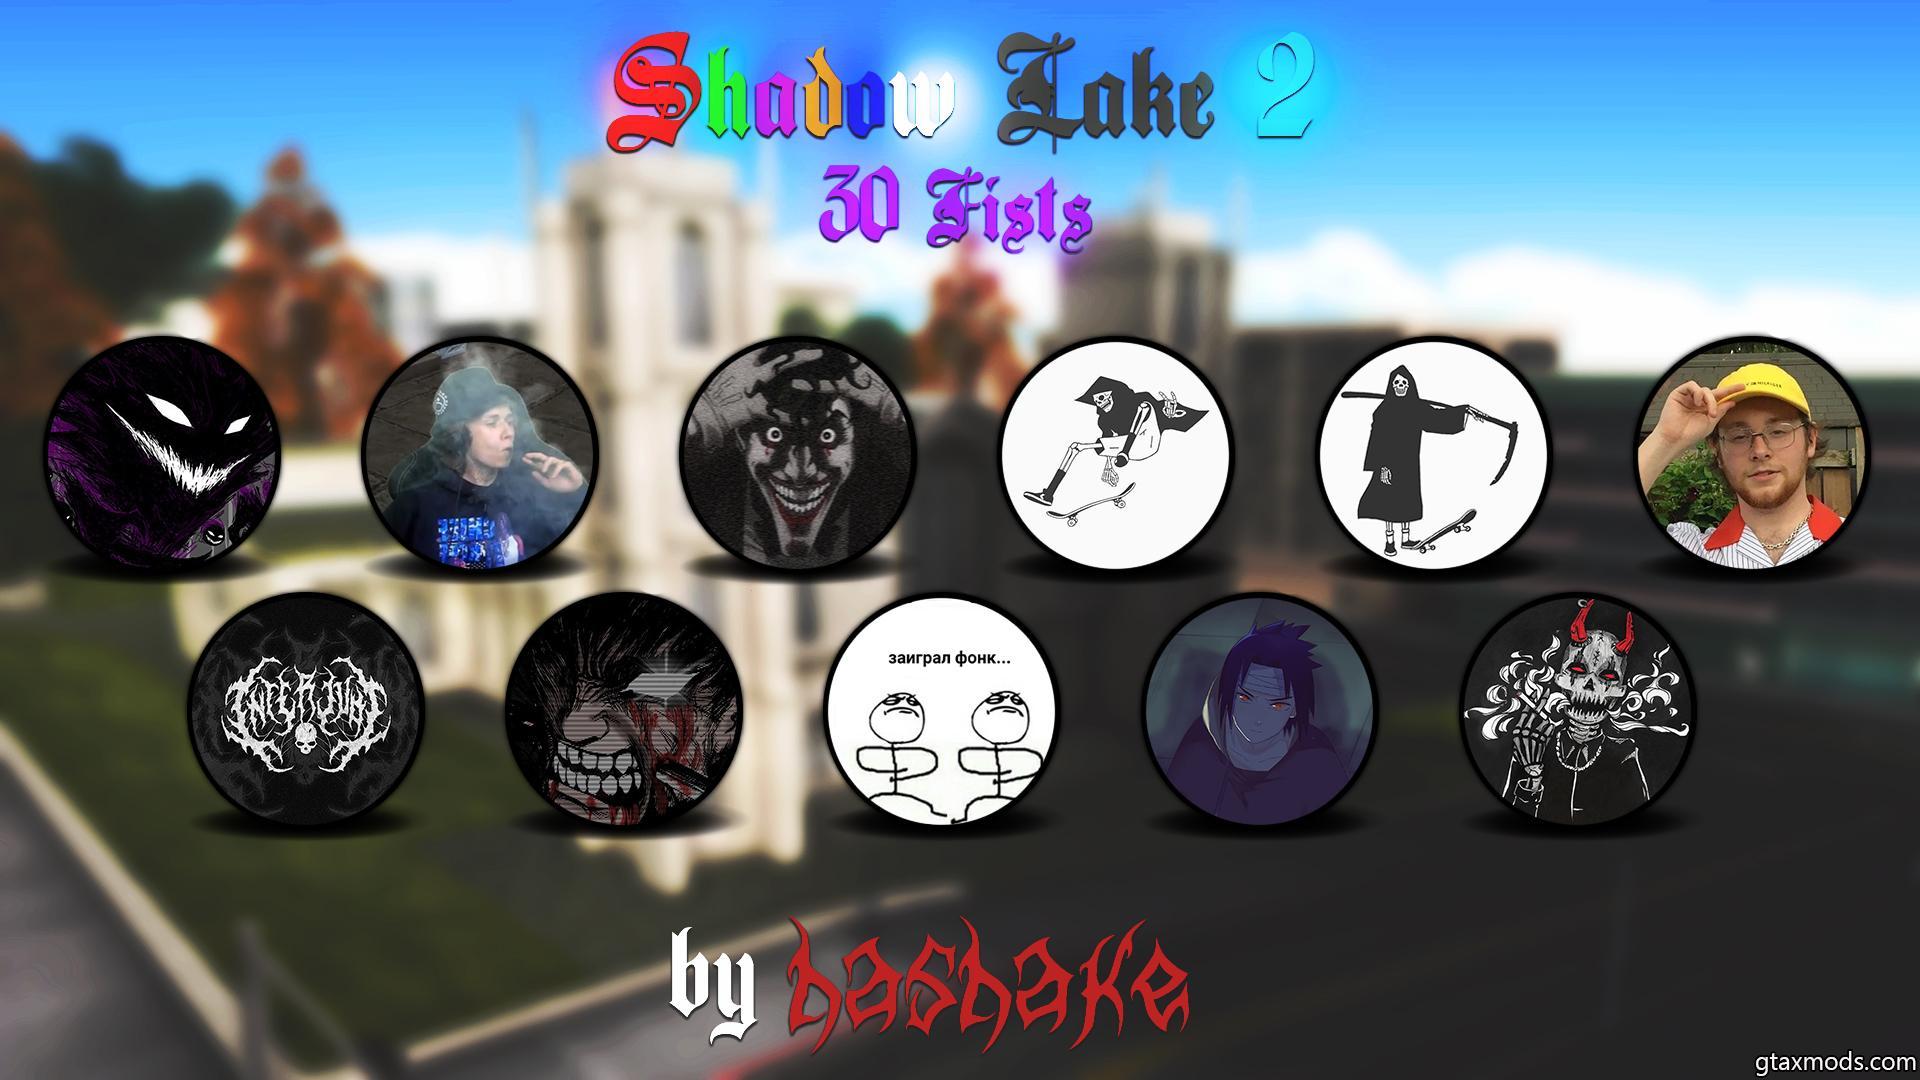 Shadow Lake 2 by hashake (больше фистов в архиве)